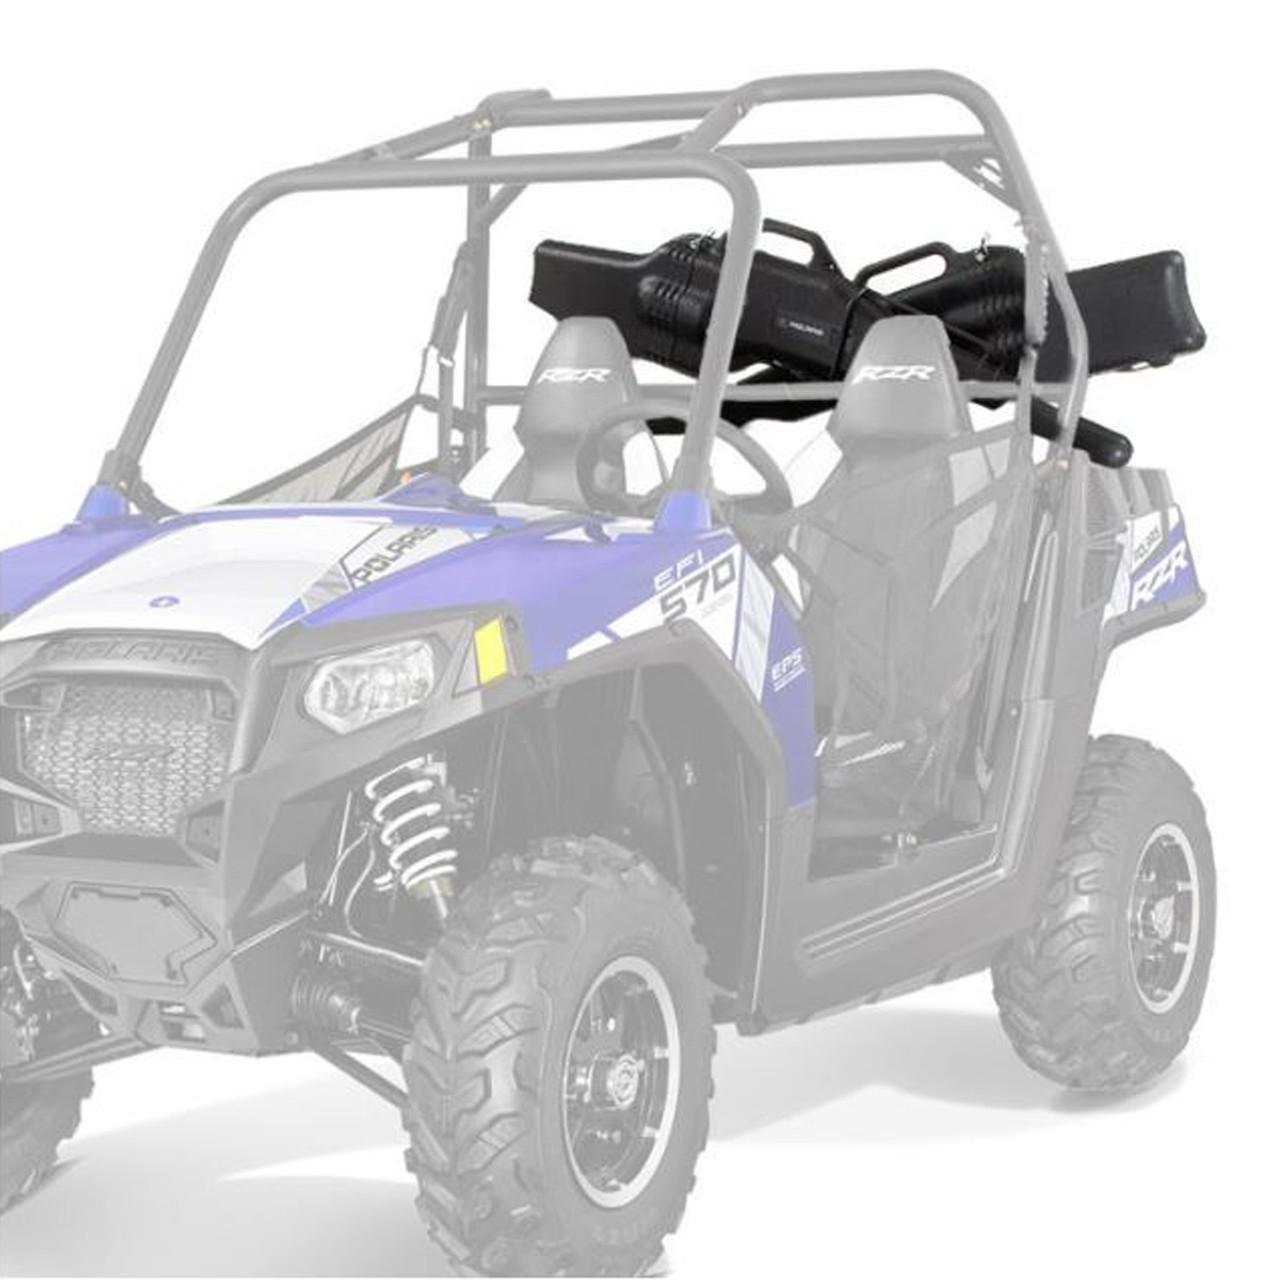 Polaris New OEM Ranger Razor RZR Lock /& Ride Fast Clamp Accessory Mount 2858880